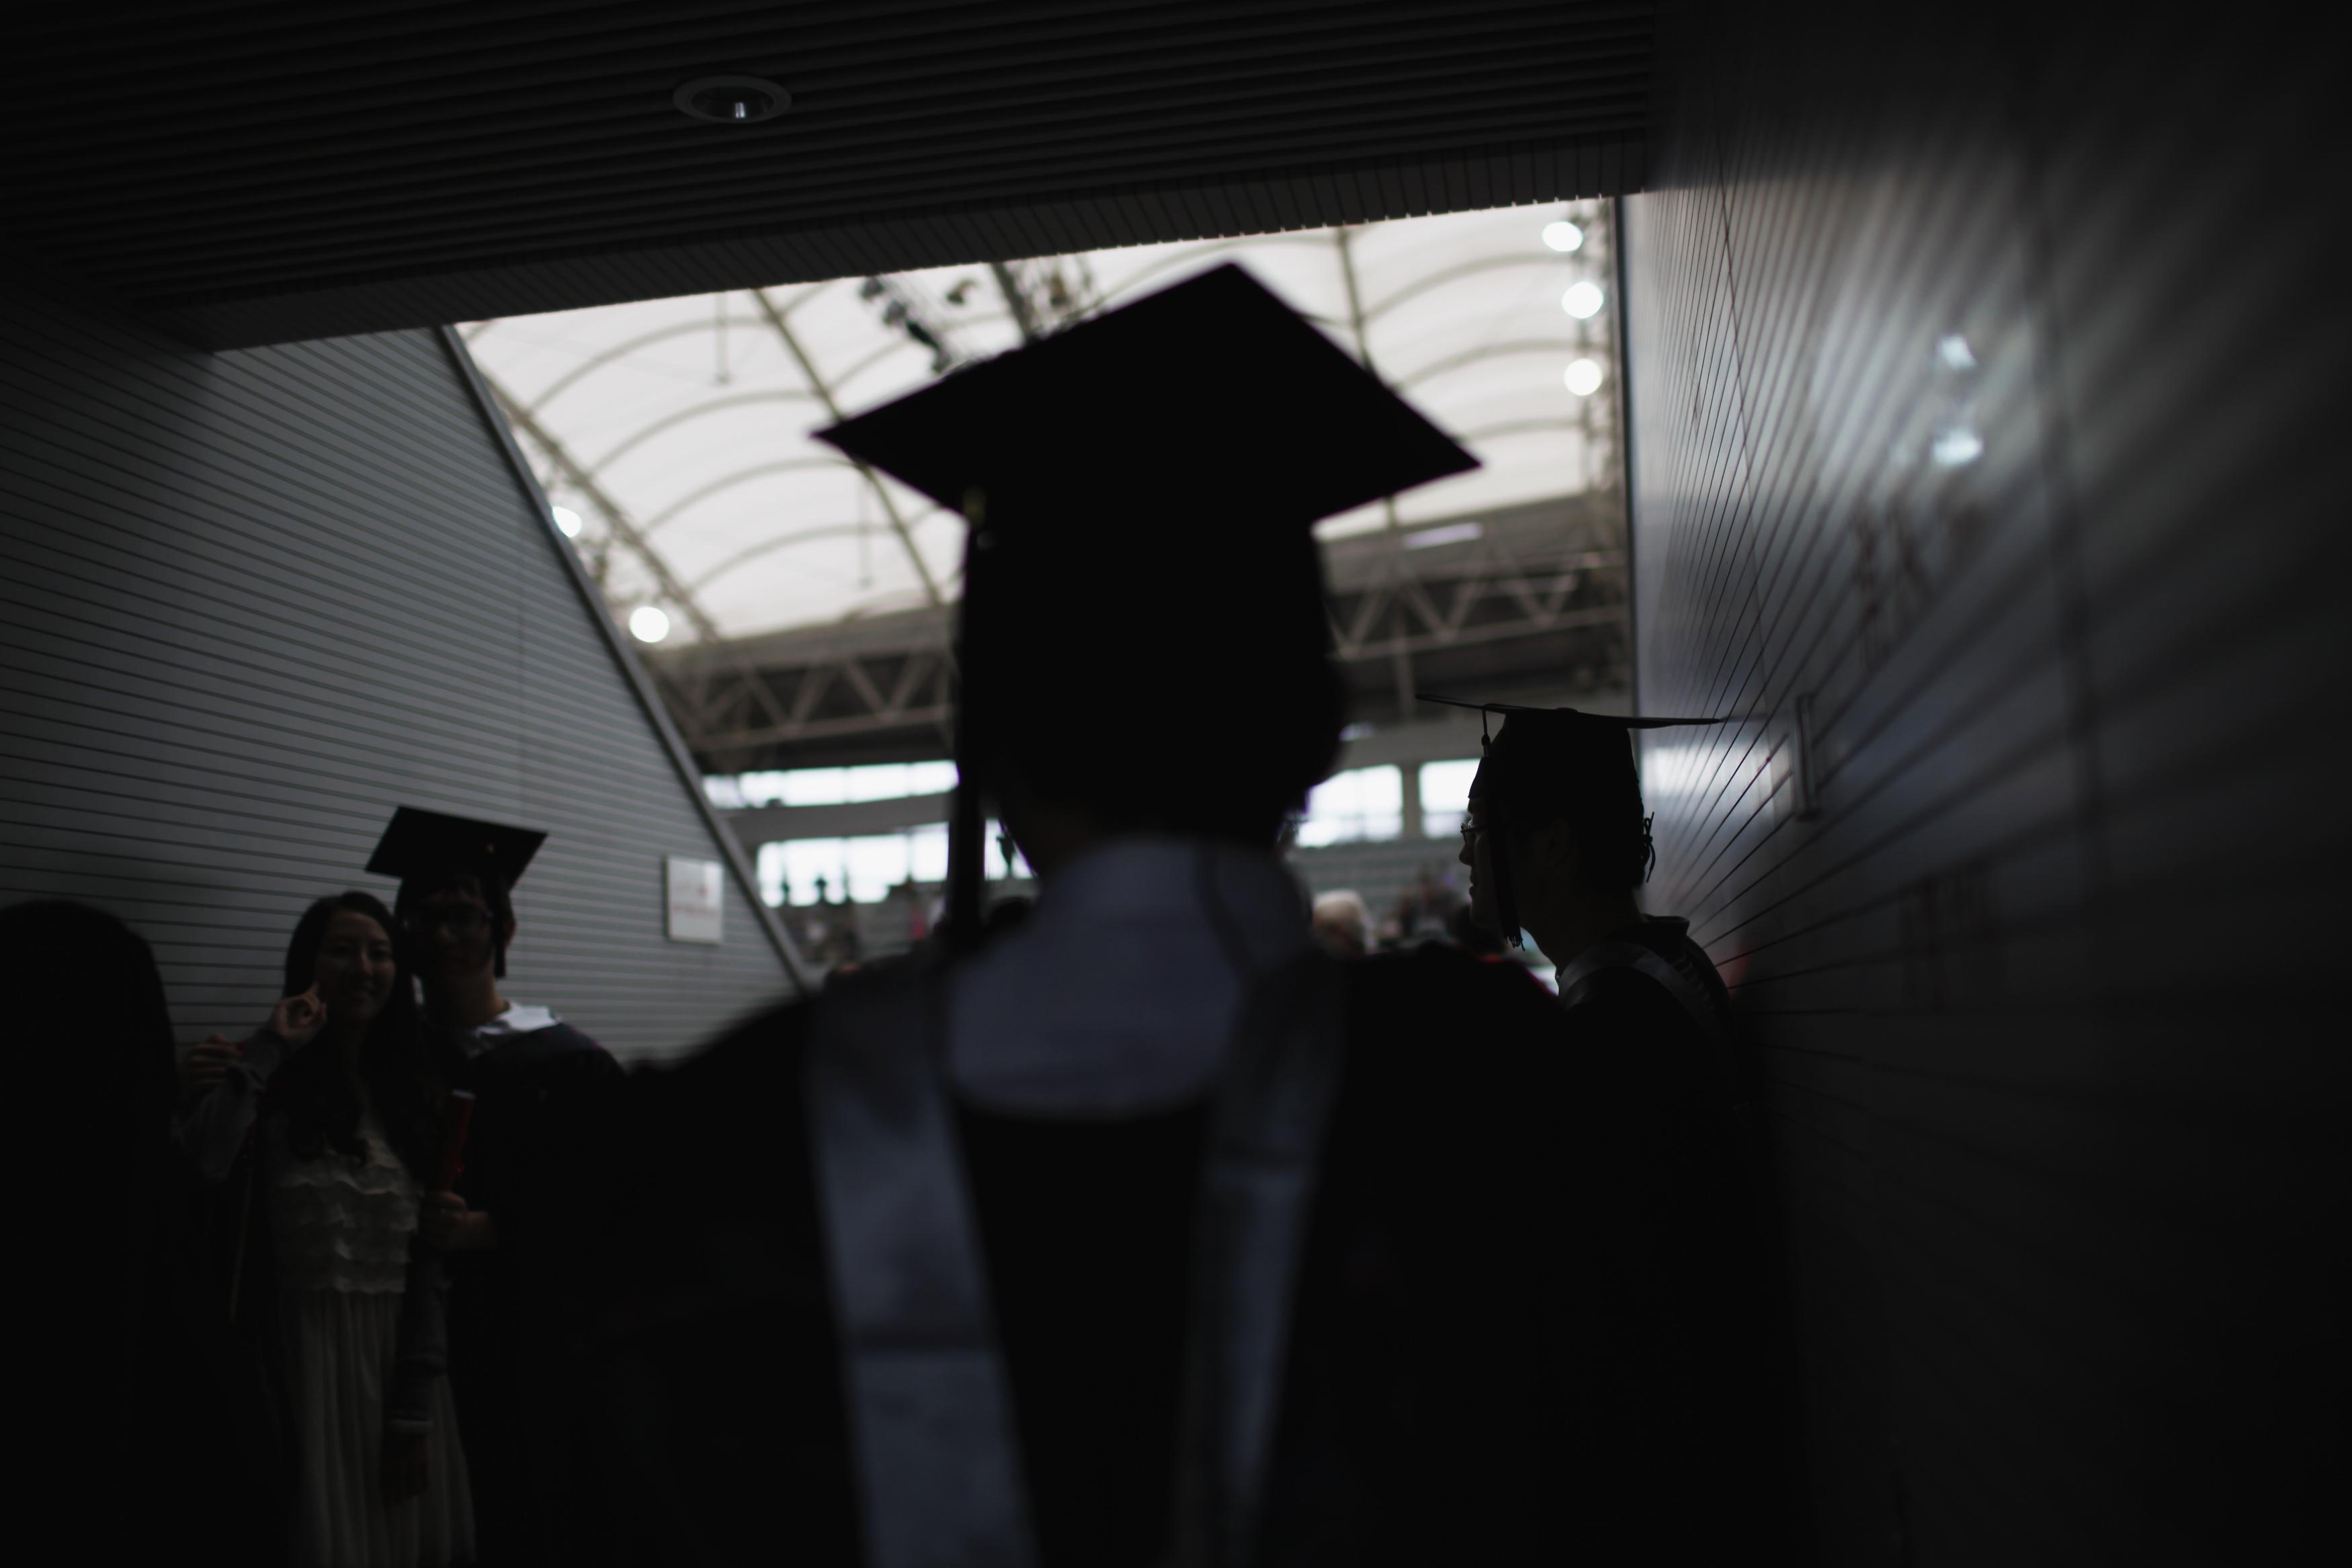 essay on goals after graduation best custom written essays from theatlantic com